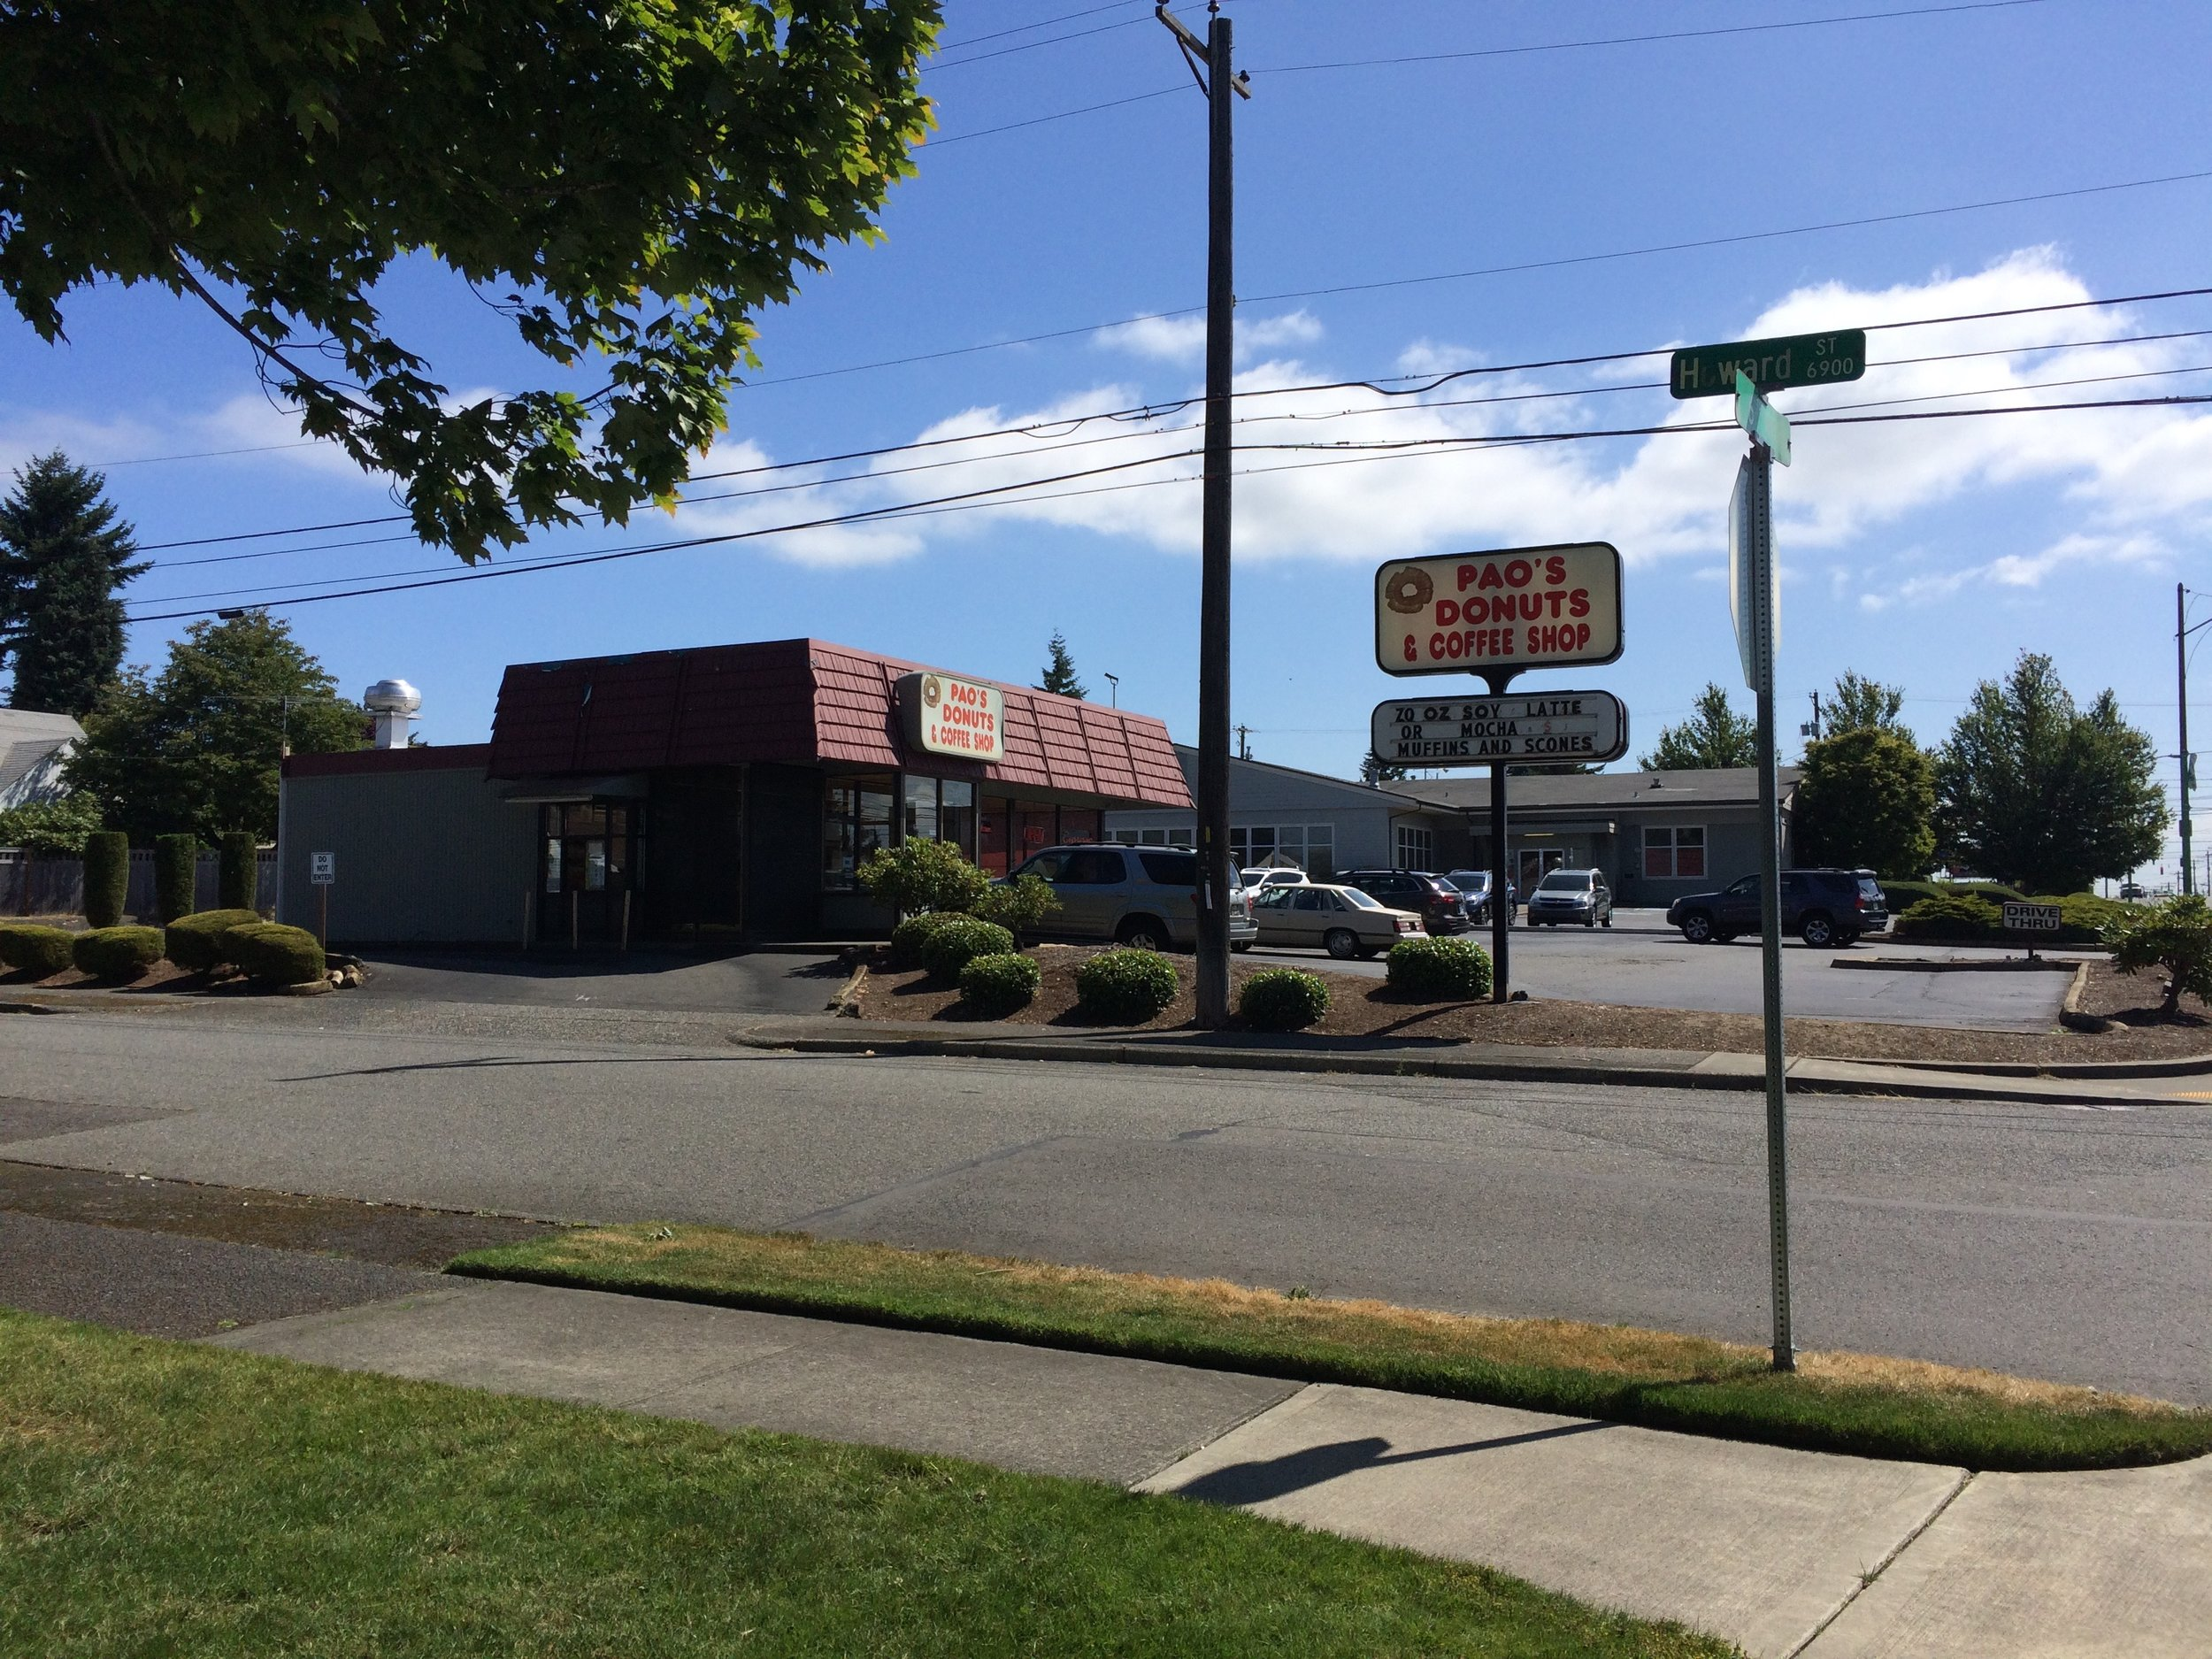 Pao's Donuts & Coffee Shop